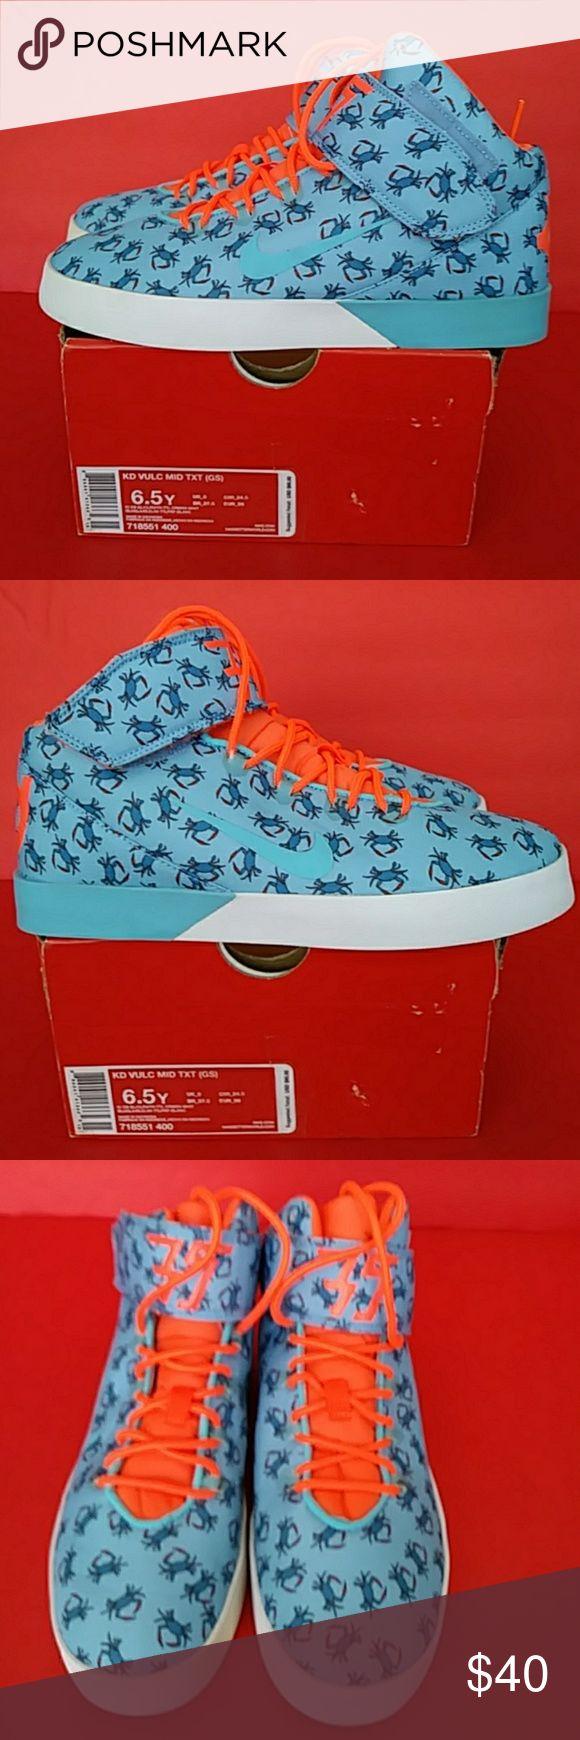 best 25 kd 6 ideas on pinterest kd 6 shoes kd shoes